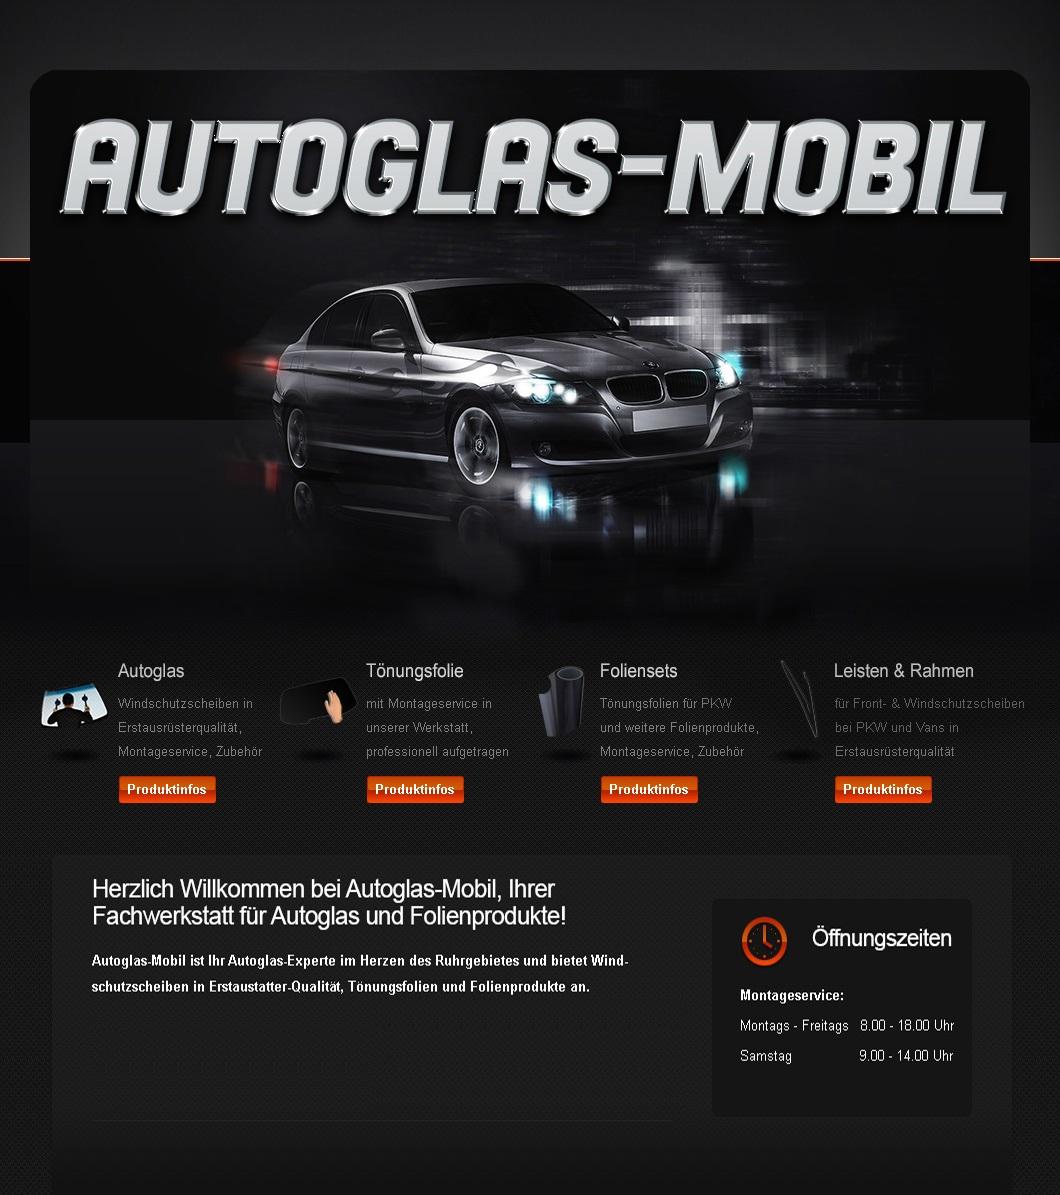 Autoglas-Mobil